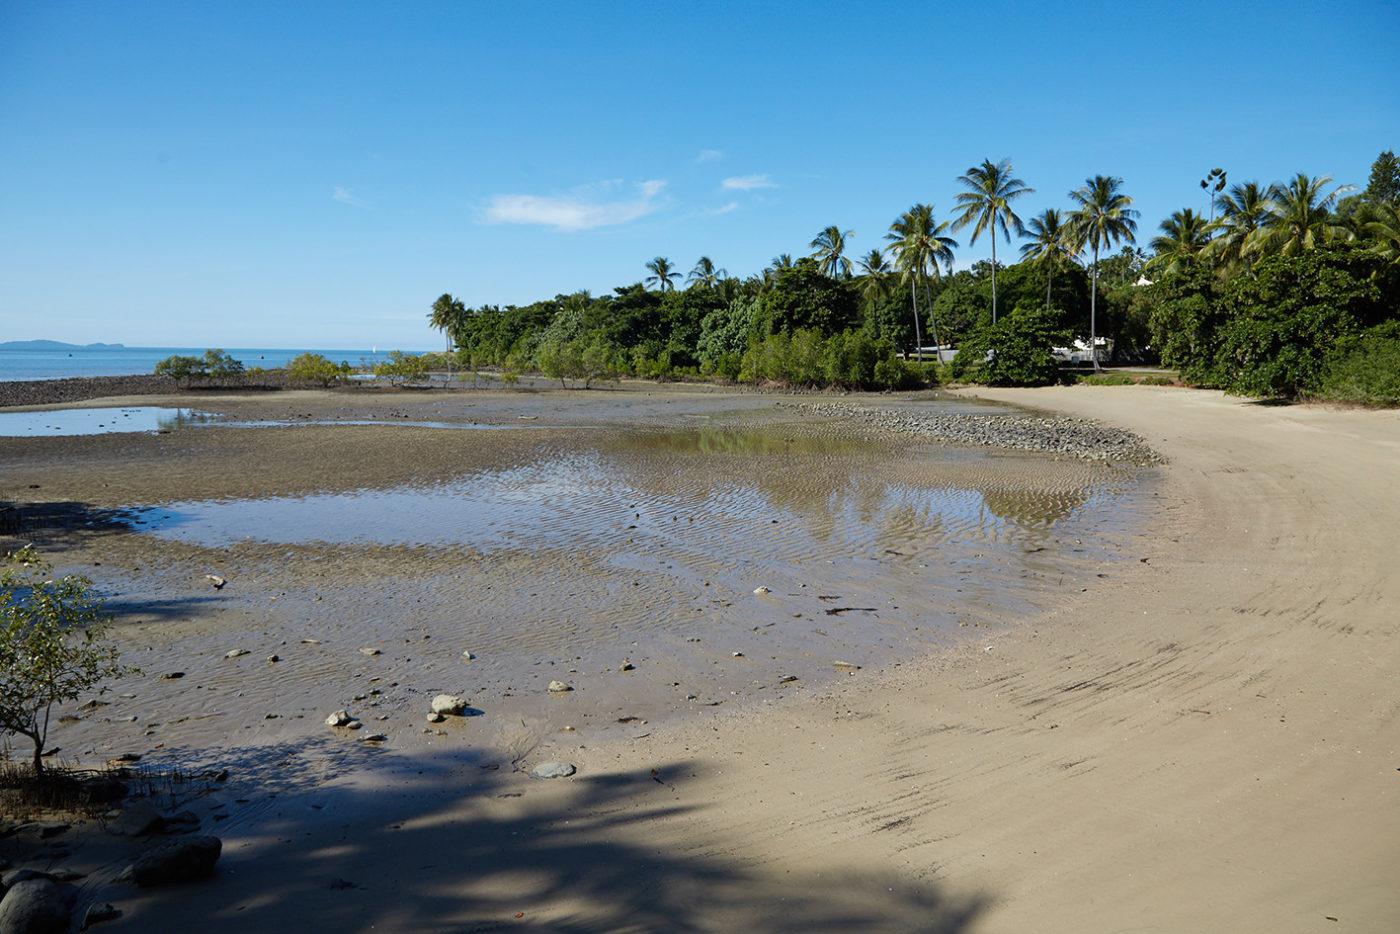 Port Douglas, Cairns, Australien, Roadtrip, Miles and Shores, Reiseblog, Reiseblogger, Strand, Bucht